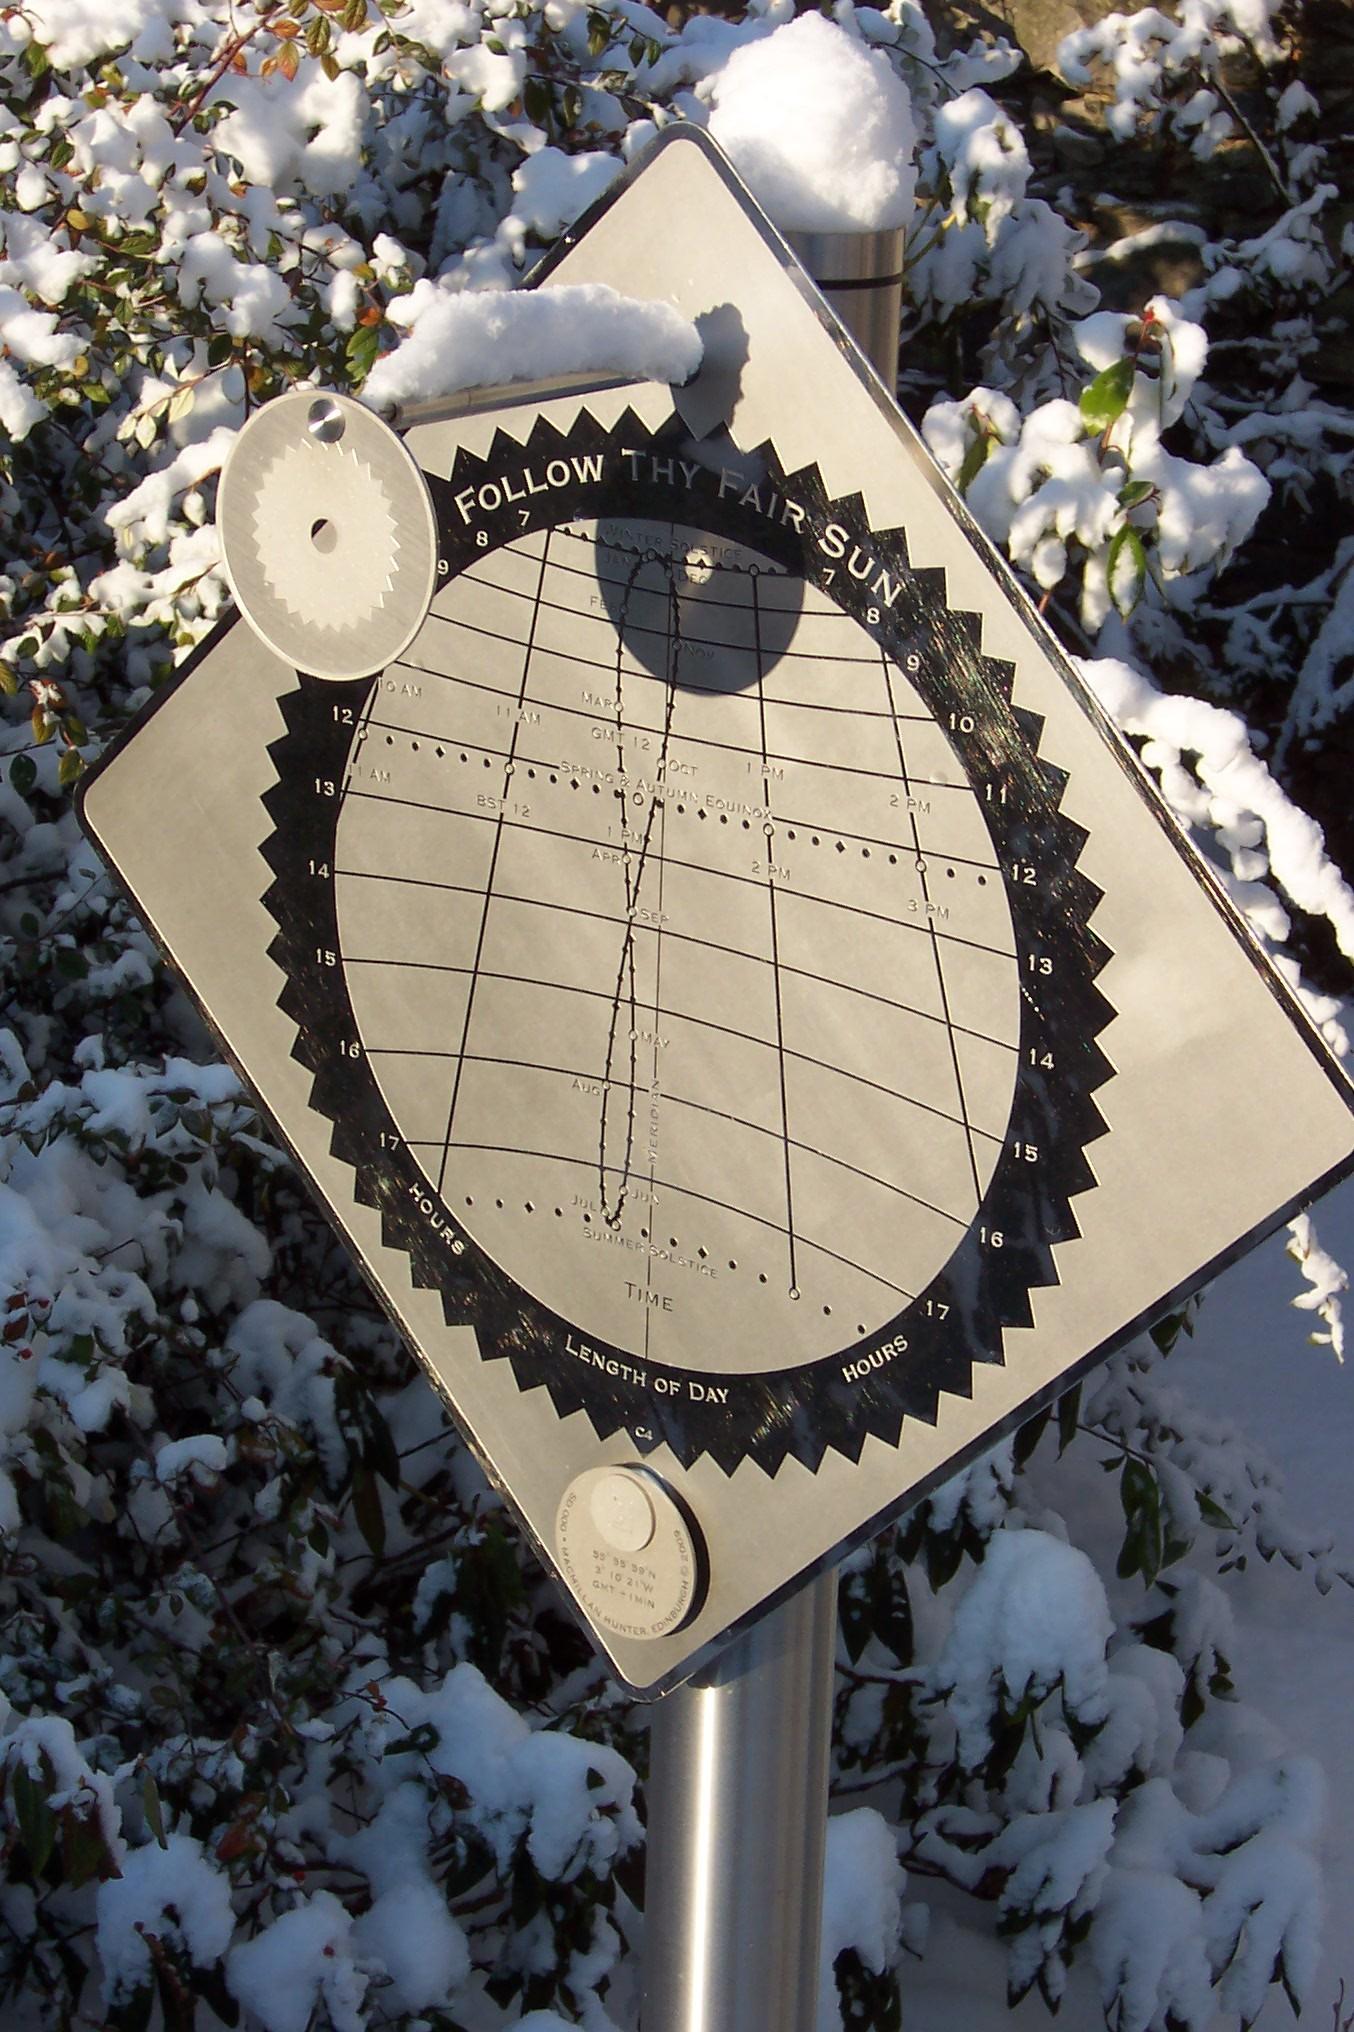 Sundial in Edinburgh at winter solstice